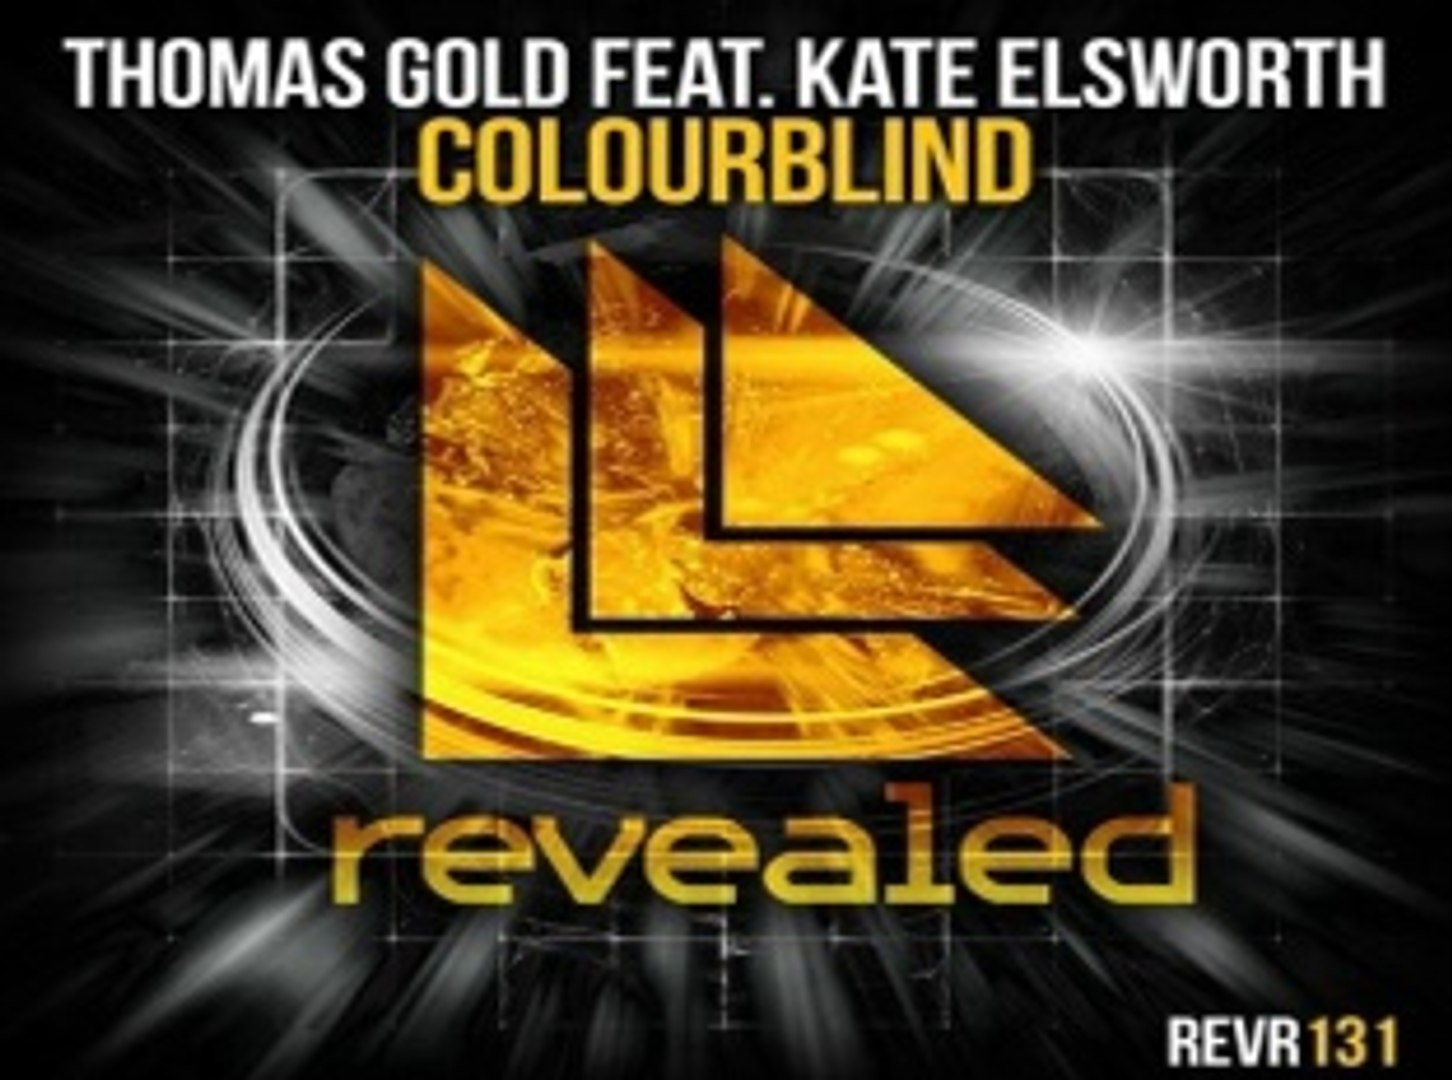 [ DOWNLOAD MP3 ] Thomas Gold - Colourblind (feat  Kate Elsworth) (Original  Mix)